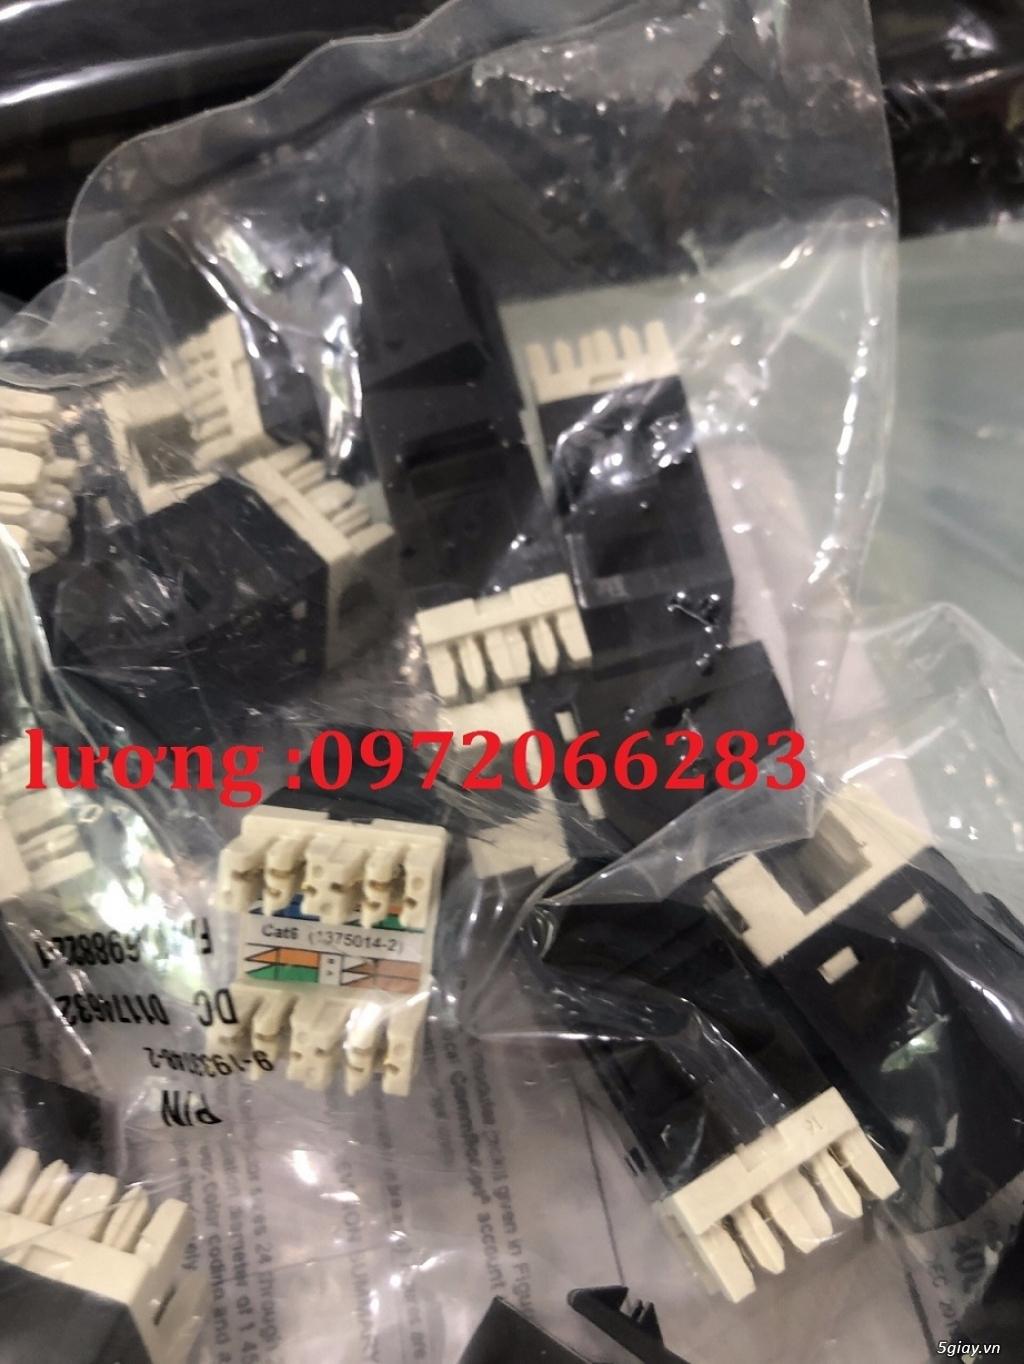 Thanh đấu nối Patch panel 48 port CAT6 COMMSCOPE P/N: 1375015-2 - 2